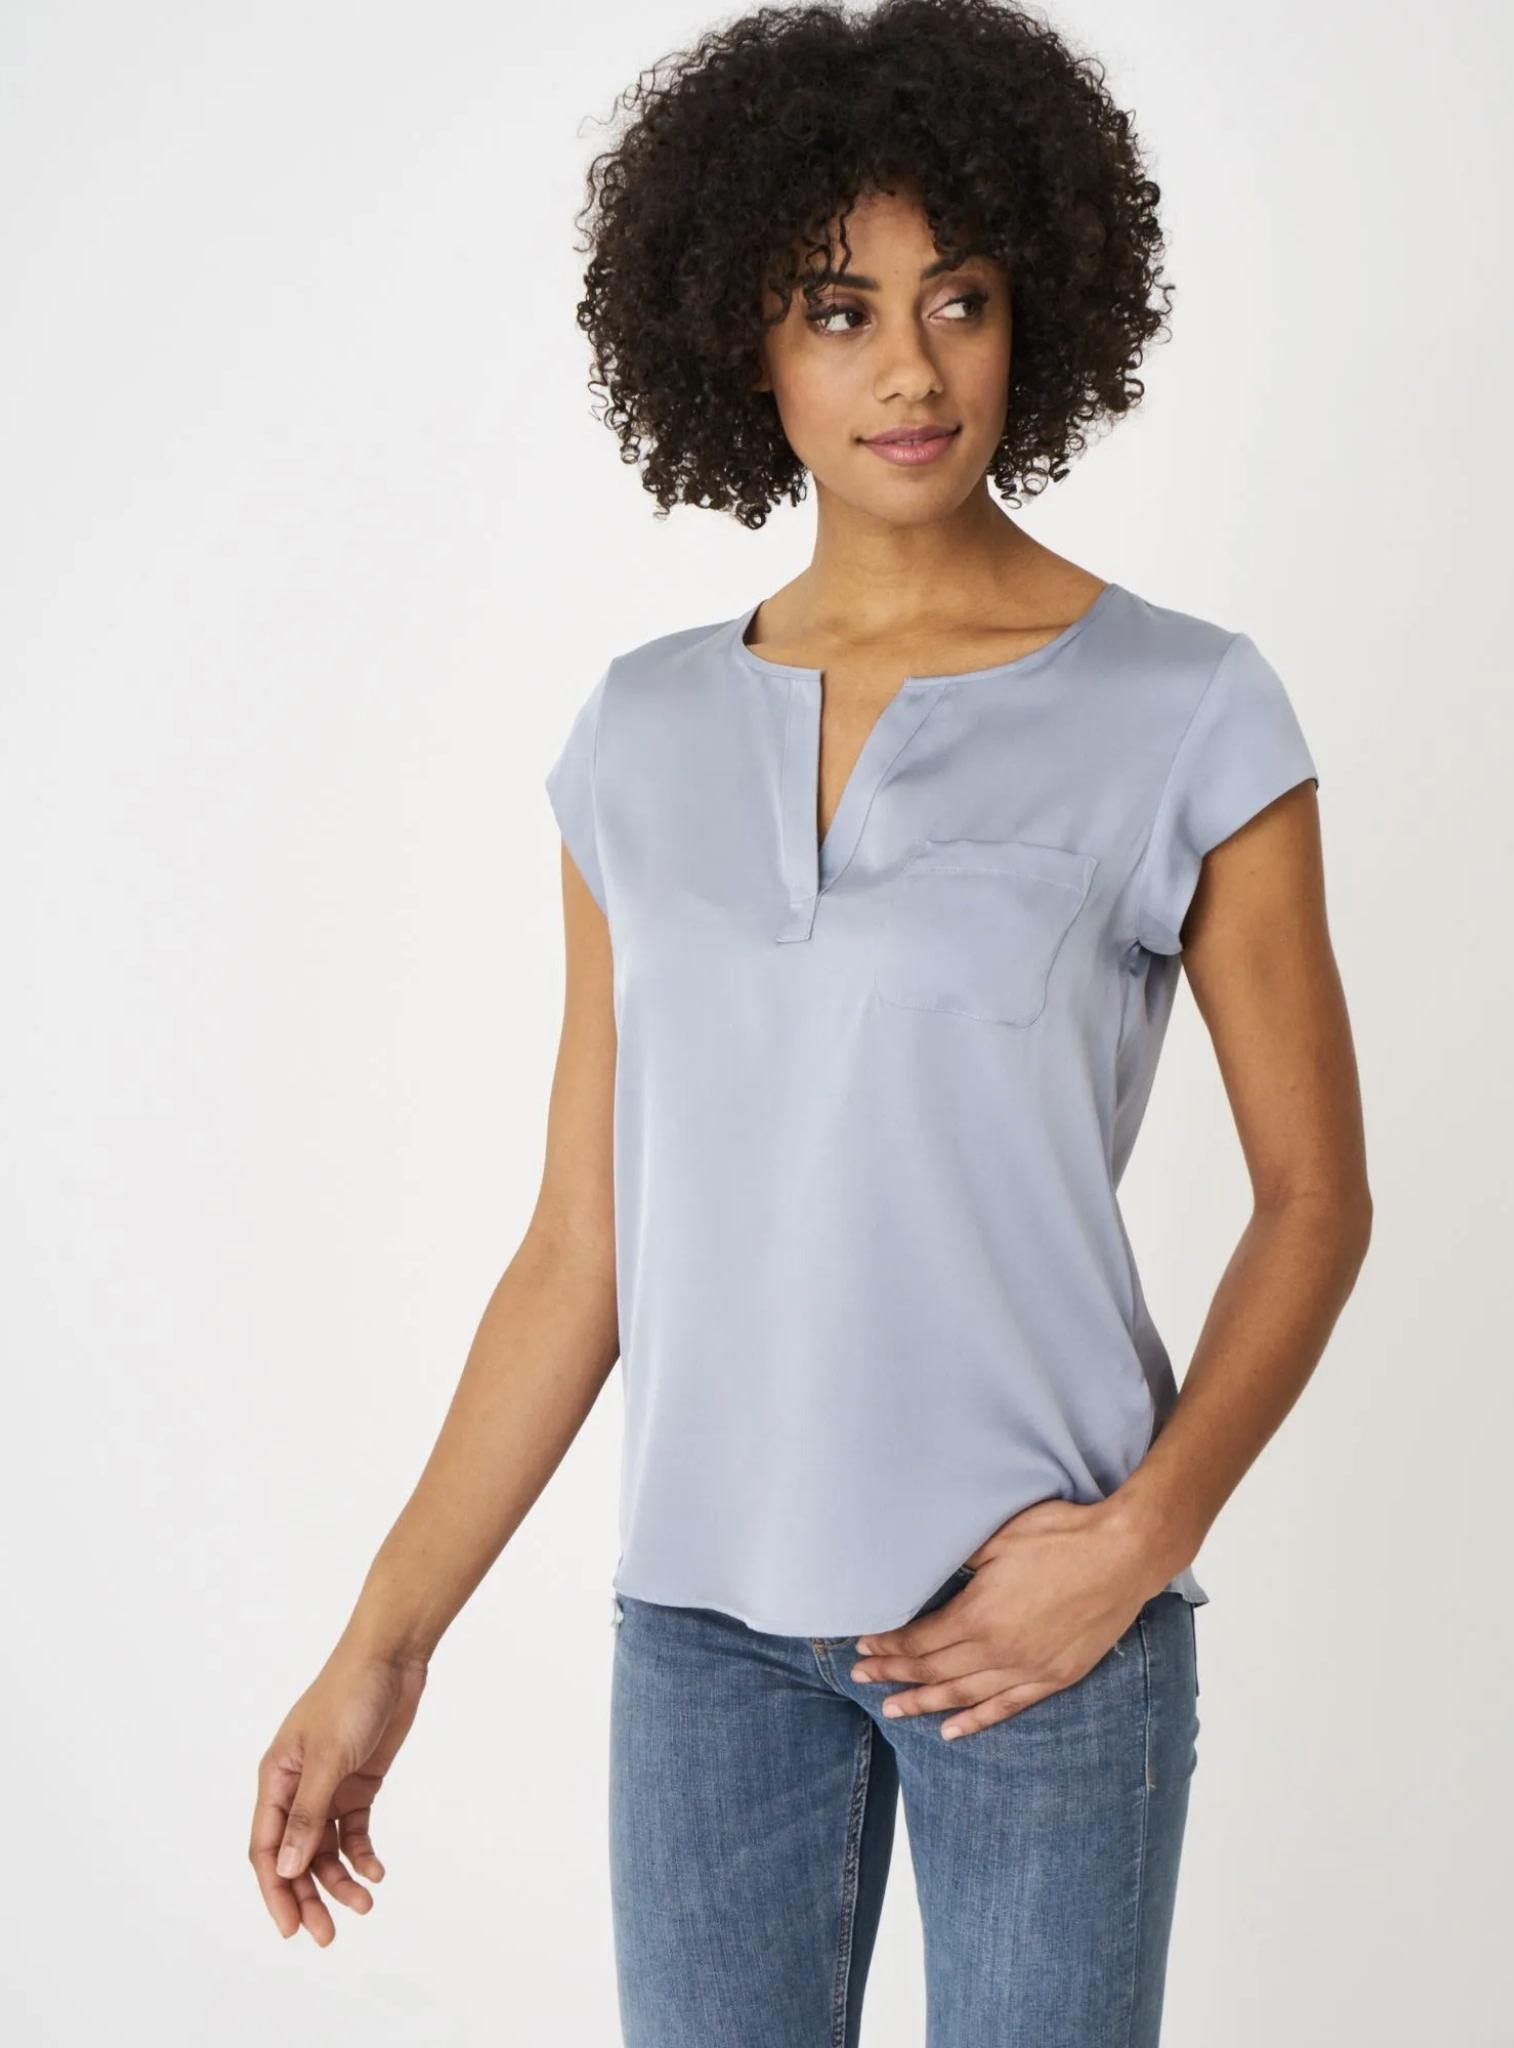 blouse repeat 600003-5